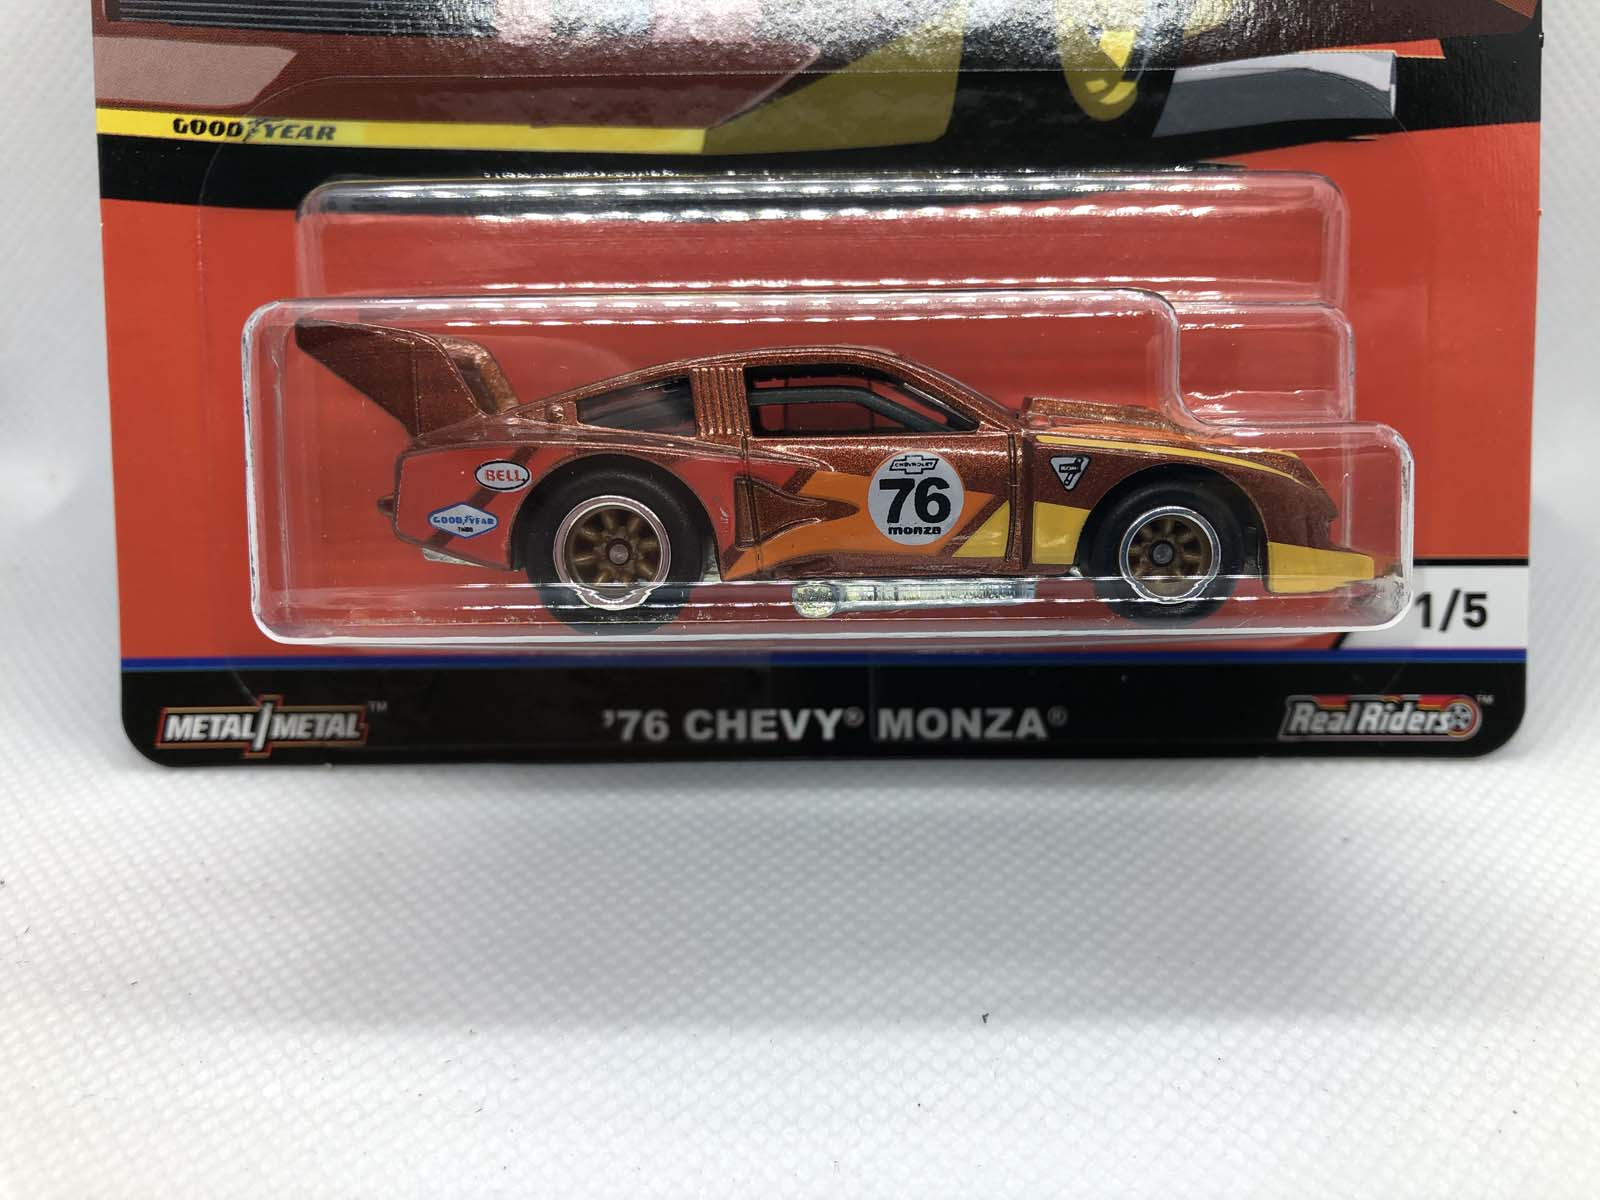 76 Chevy Monza